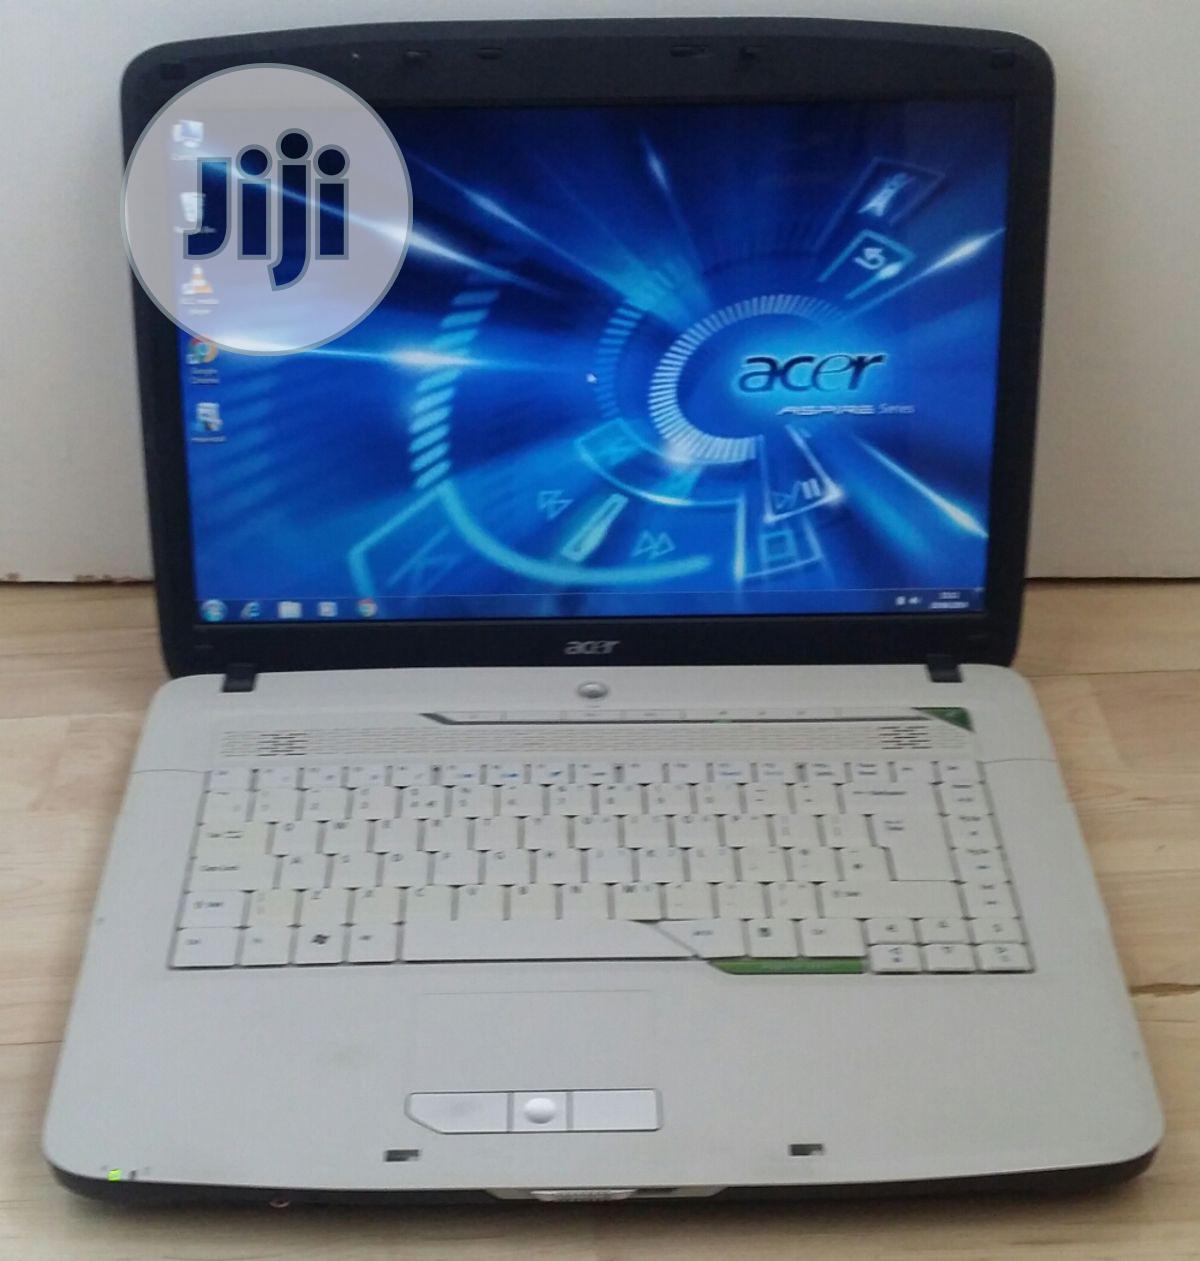 Laptop Acer Aspire 5315 2GB Intel 250GB | Laptops & Computers for sale in Sagamu, Ogun State, Nigeria